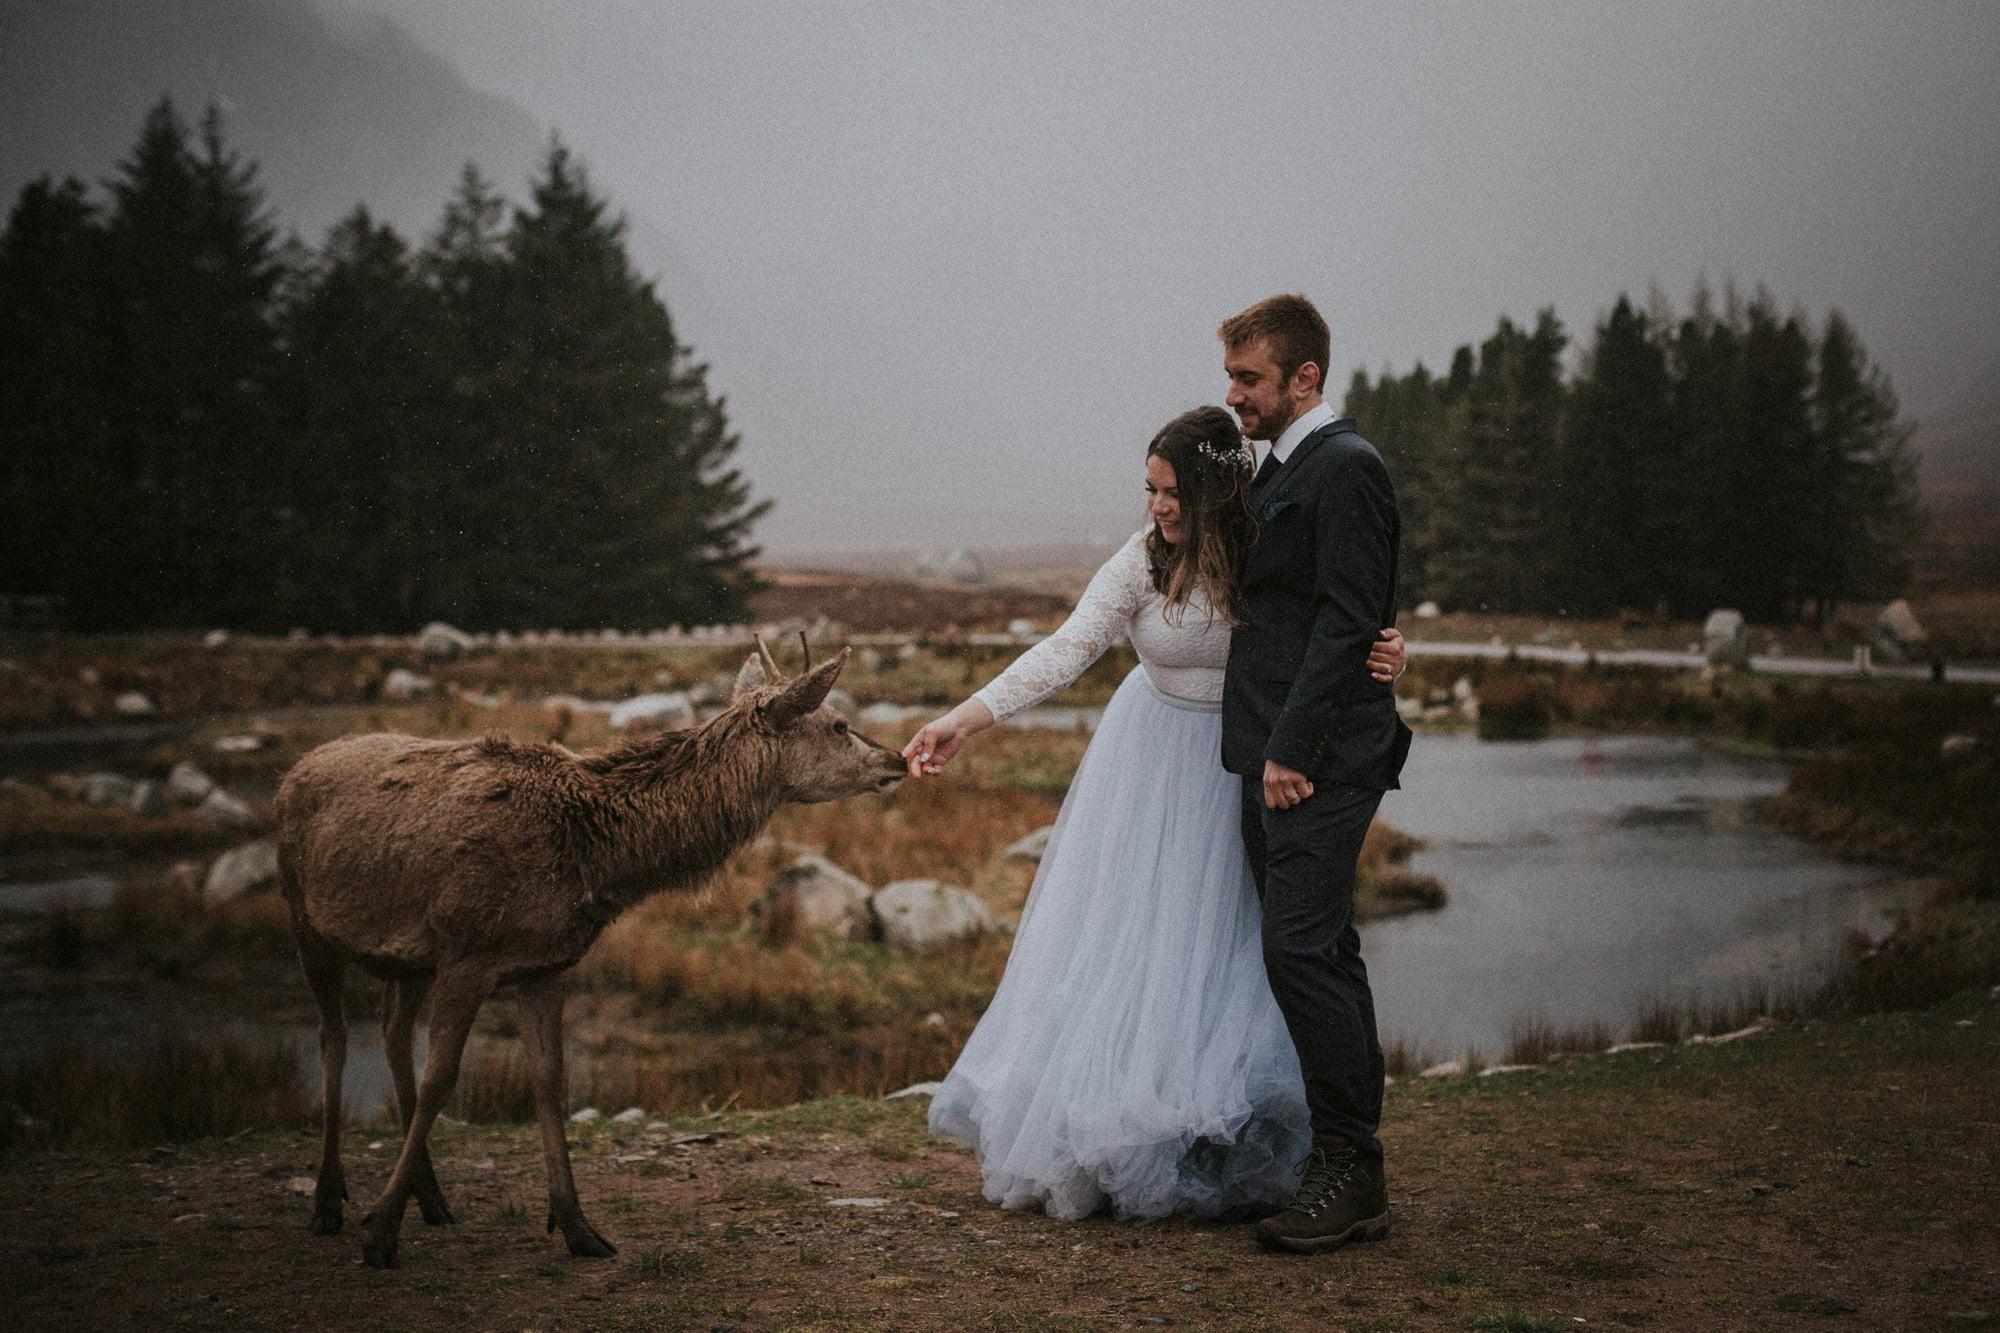 Kingshouse Glencoe wedding, Elopement in Glencoe, Scotland. Intimate wedding in Scotland, Kingshouse Hotel Glencoe wedding, Glen Etive elopement